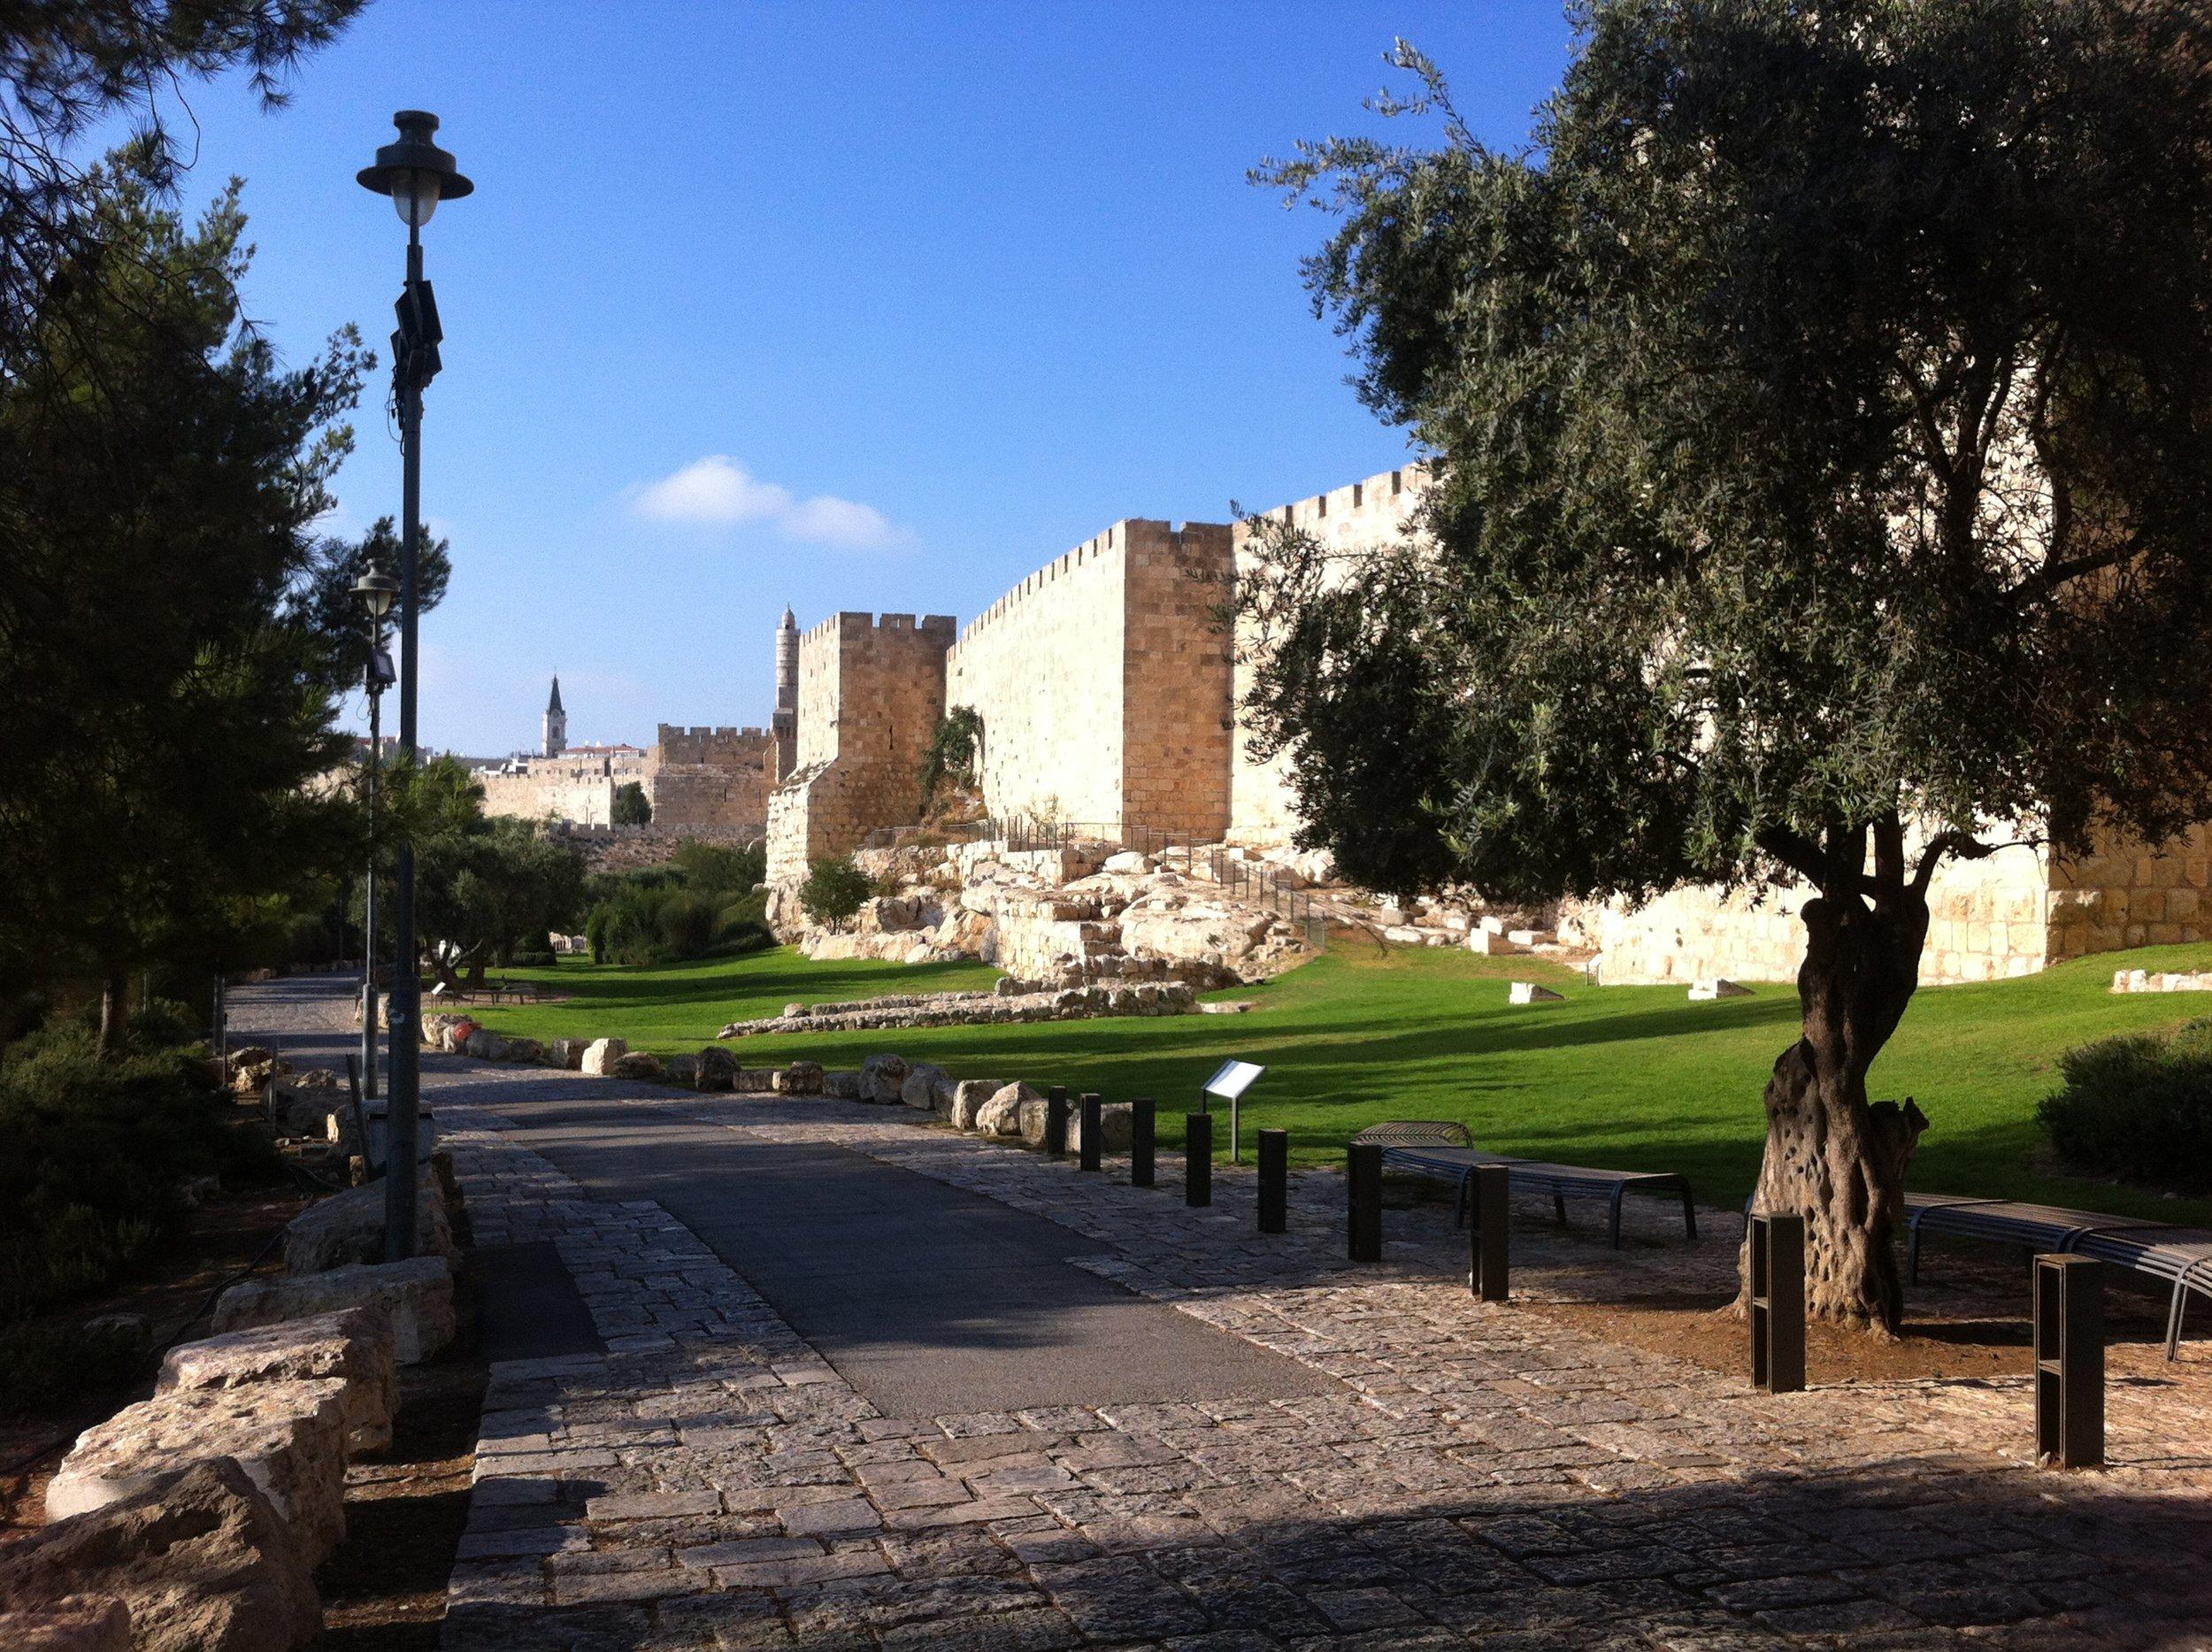 City walls, Jerusalem, Israel August 2018